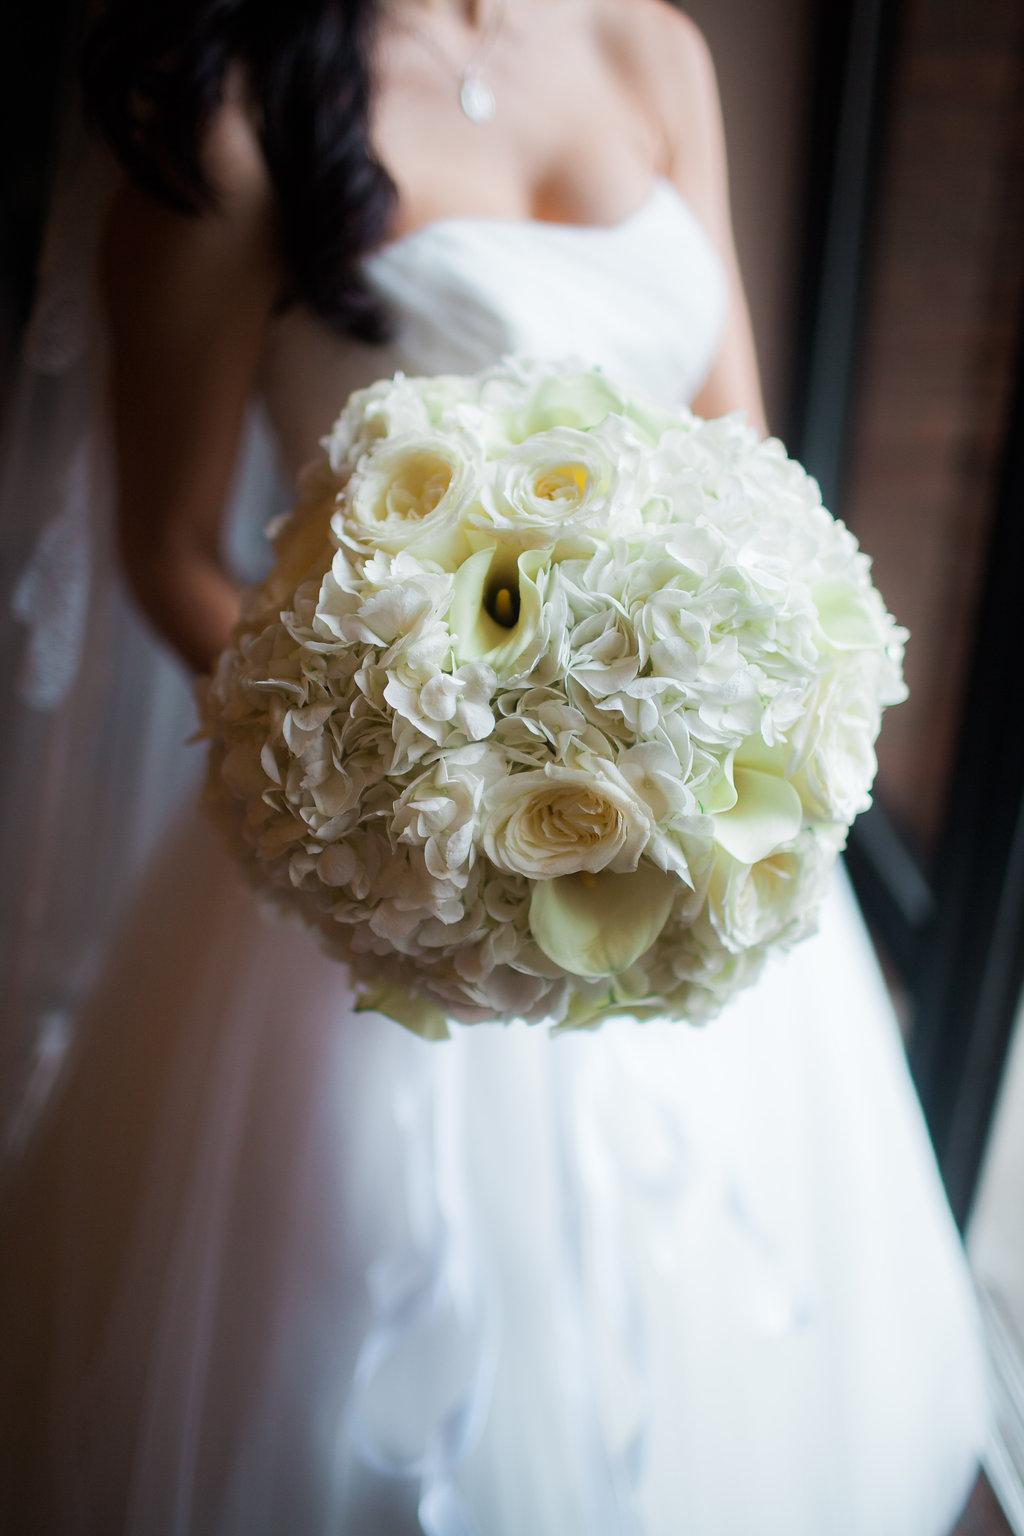 bride holding white bouquet